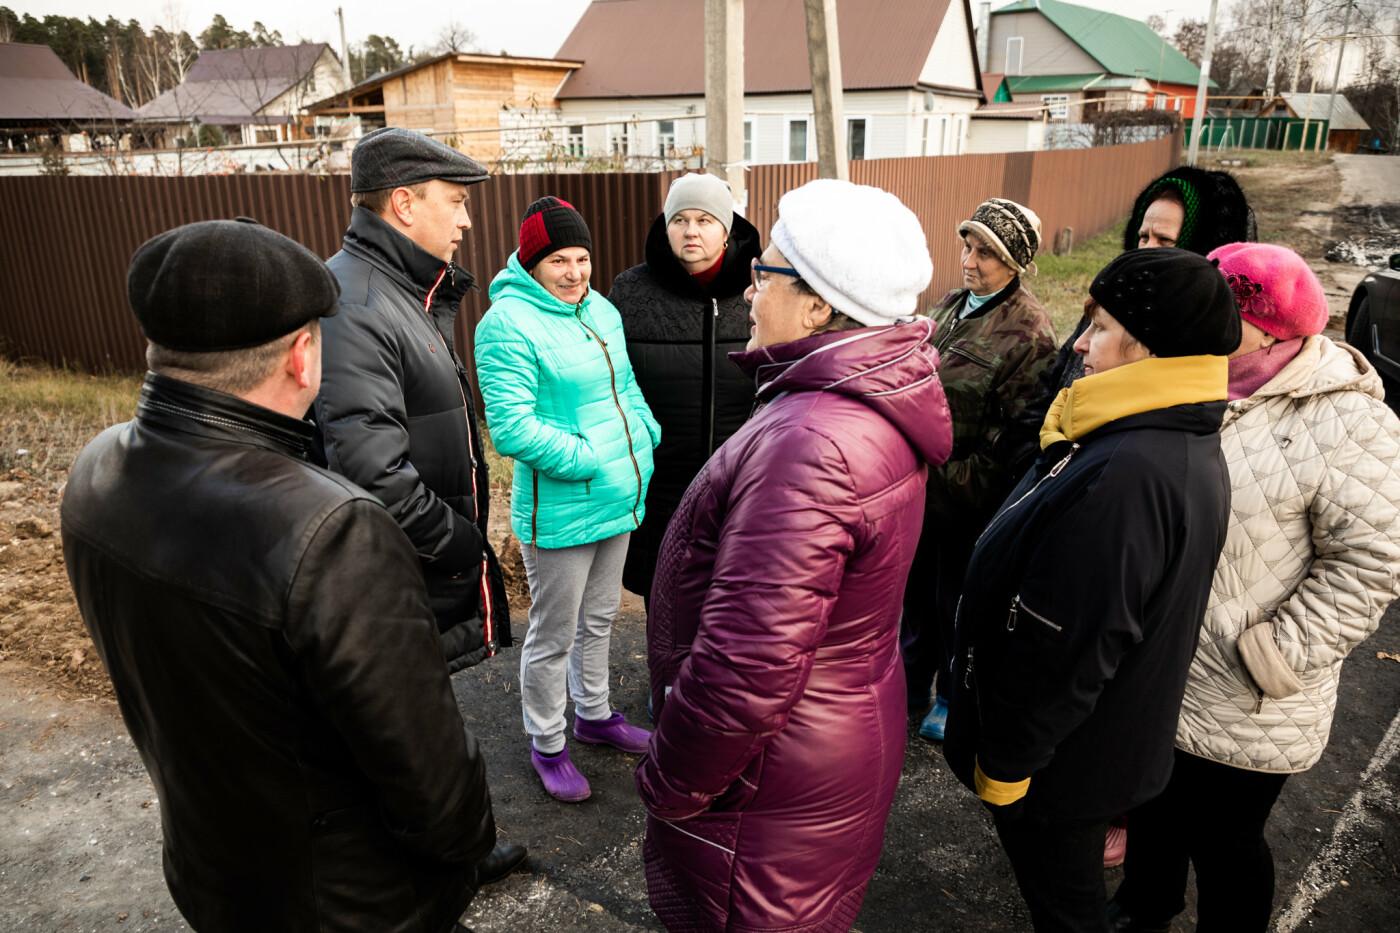 В пригороде Тамбова построили новую дорогу за 3,4 млн рублей, фото-5